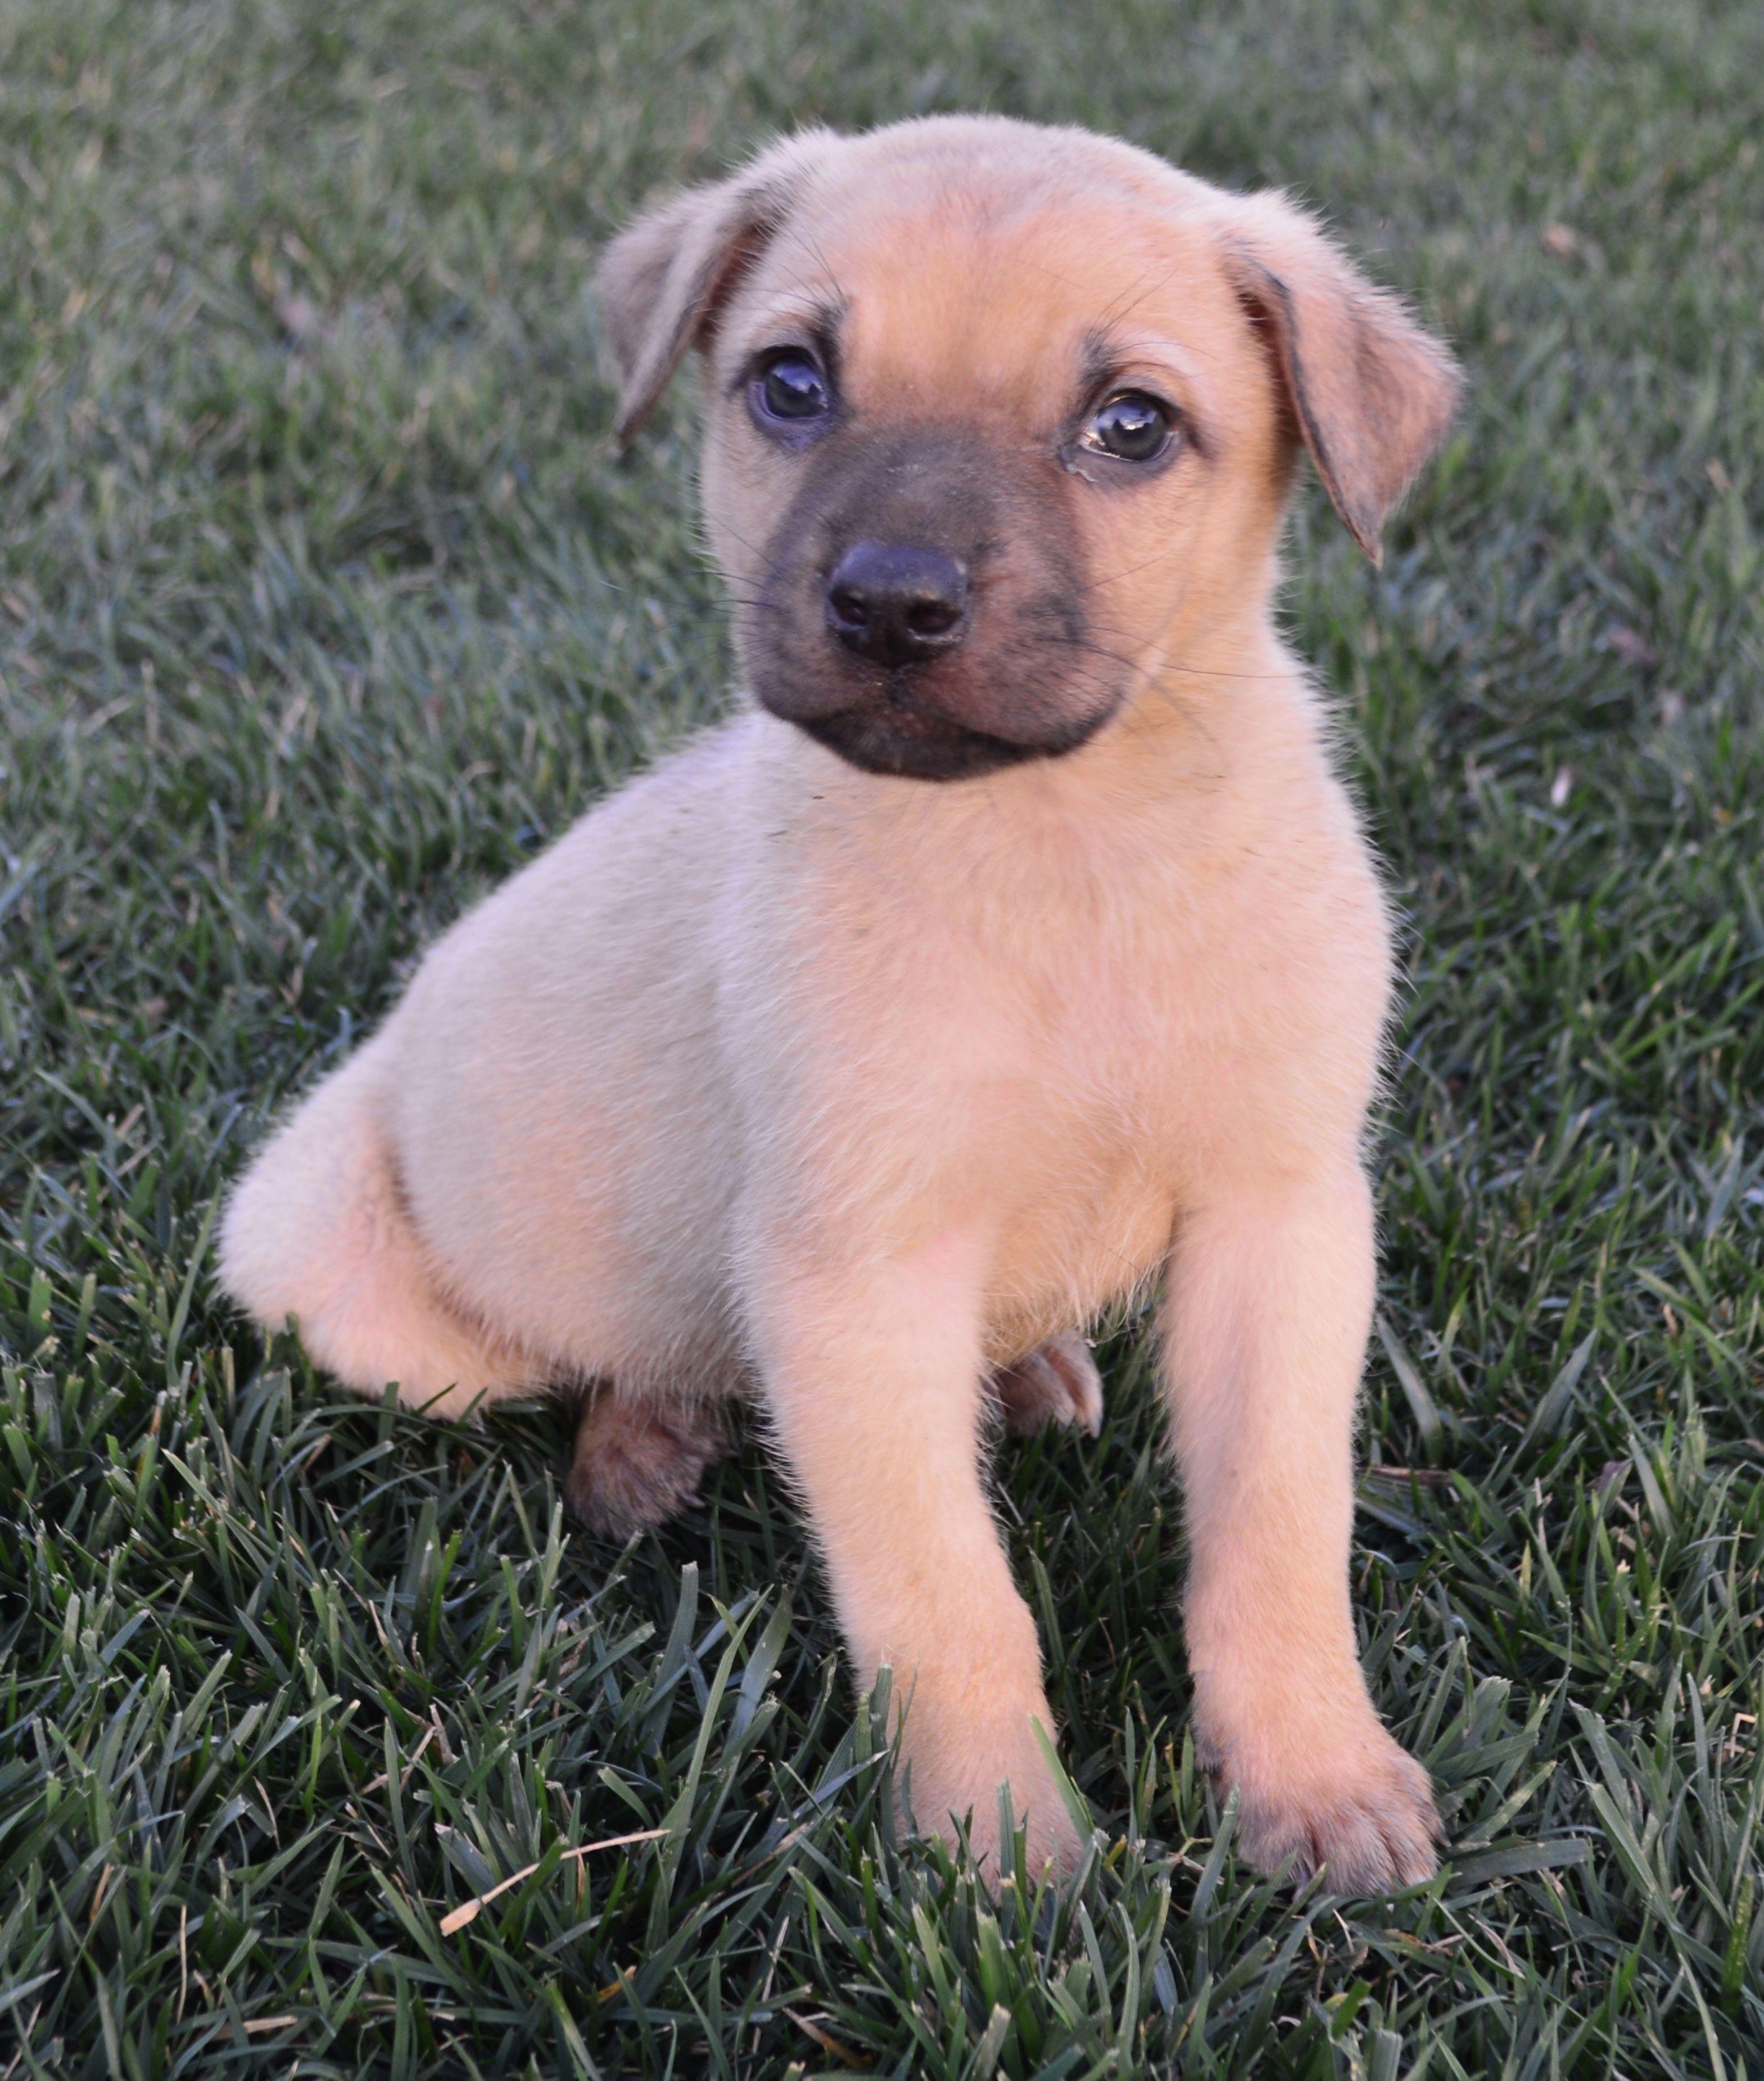 Shug Dog For Adoption In Palo Alto Ca Adn 468549 On Puppyfinder Com Gender Male Age Baby Dog Adoption Dogs Adoption